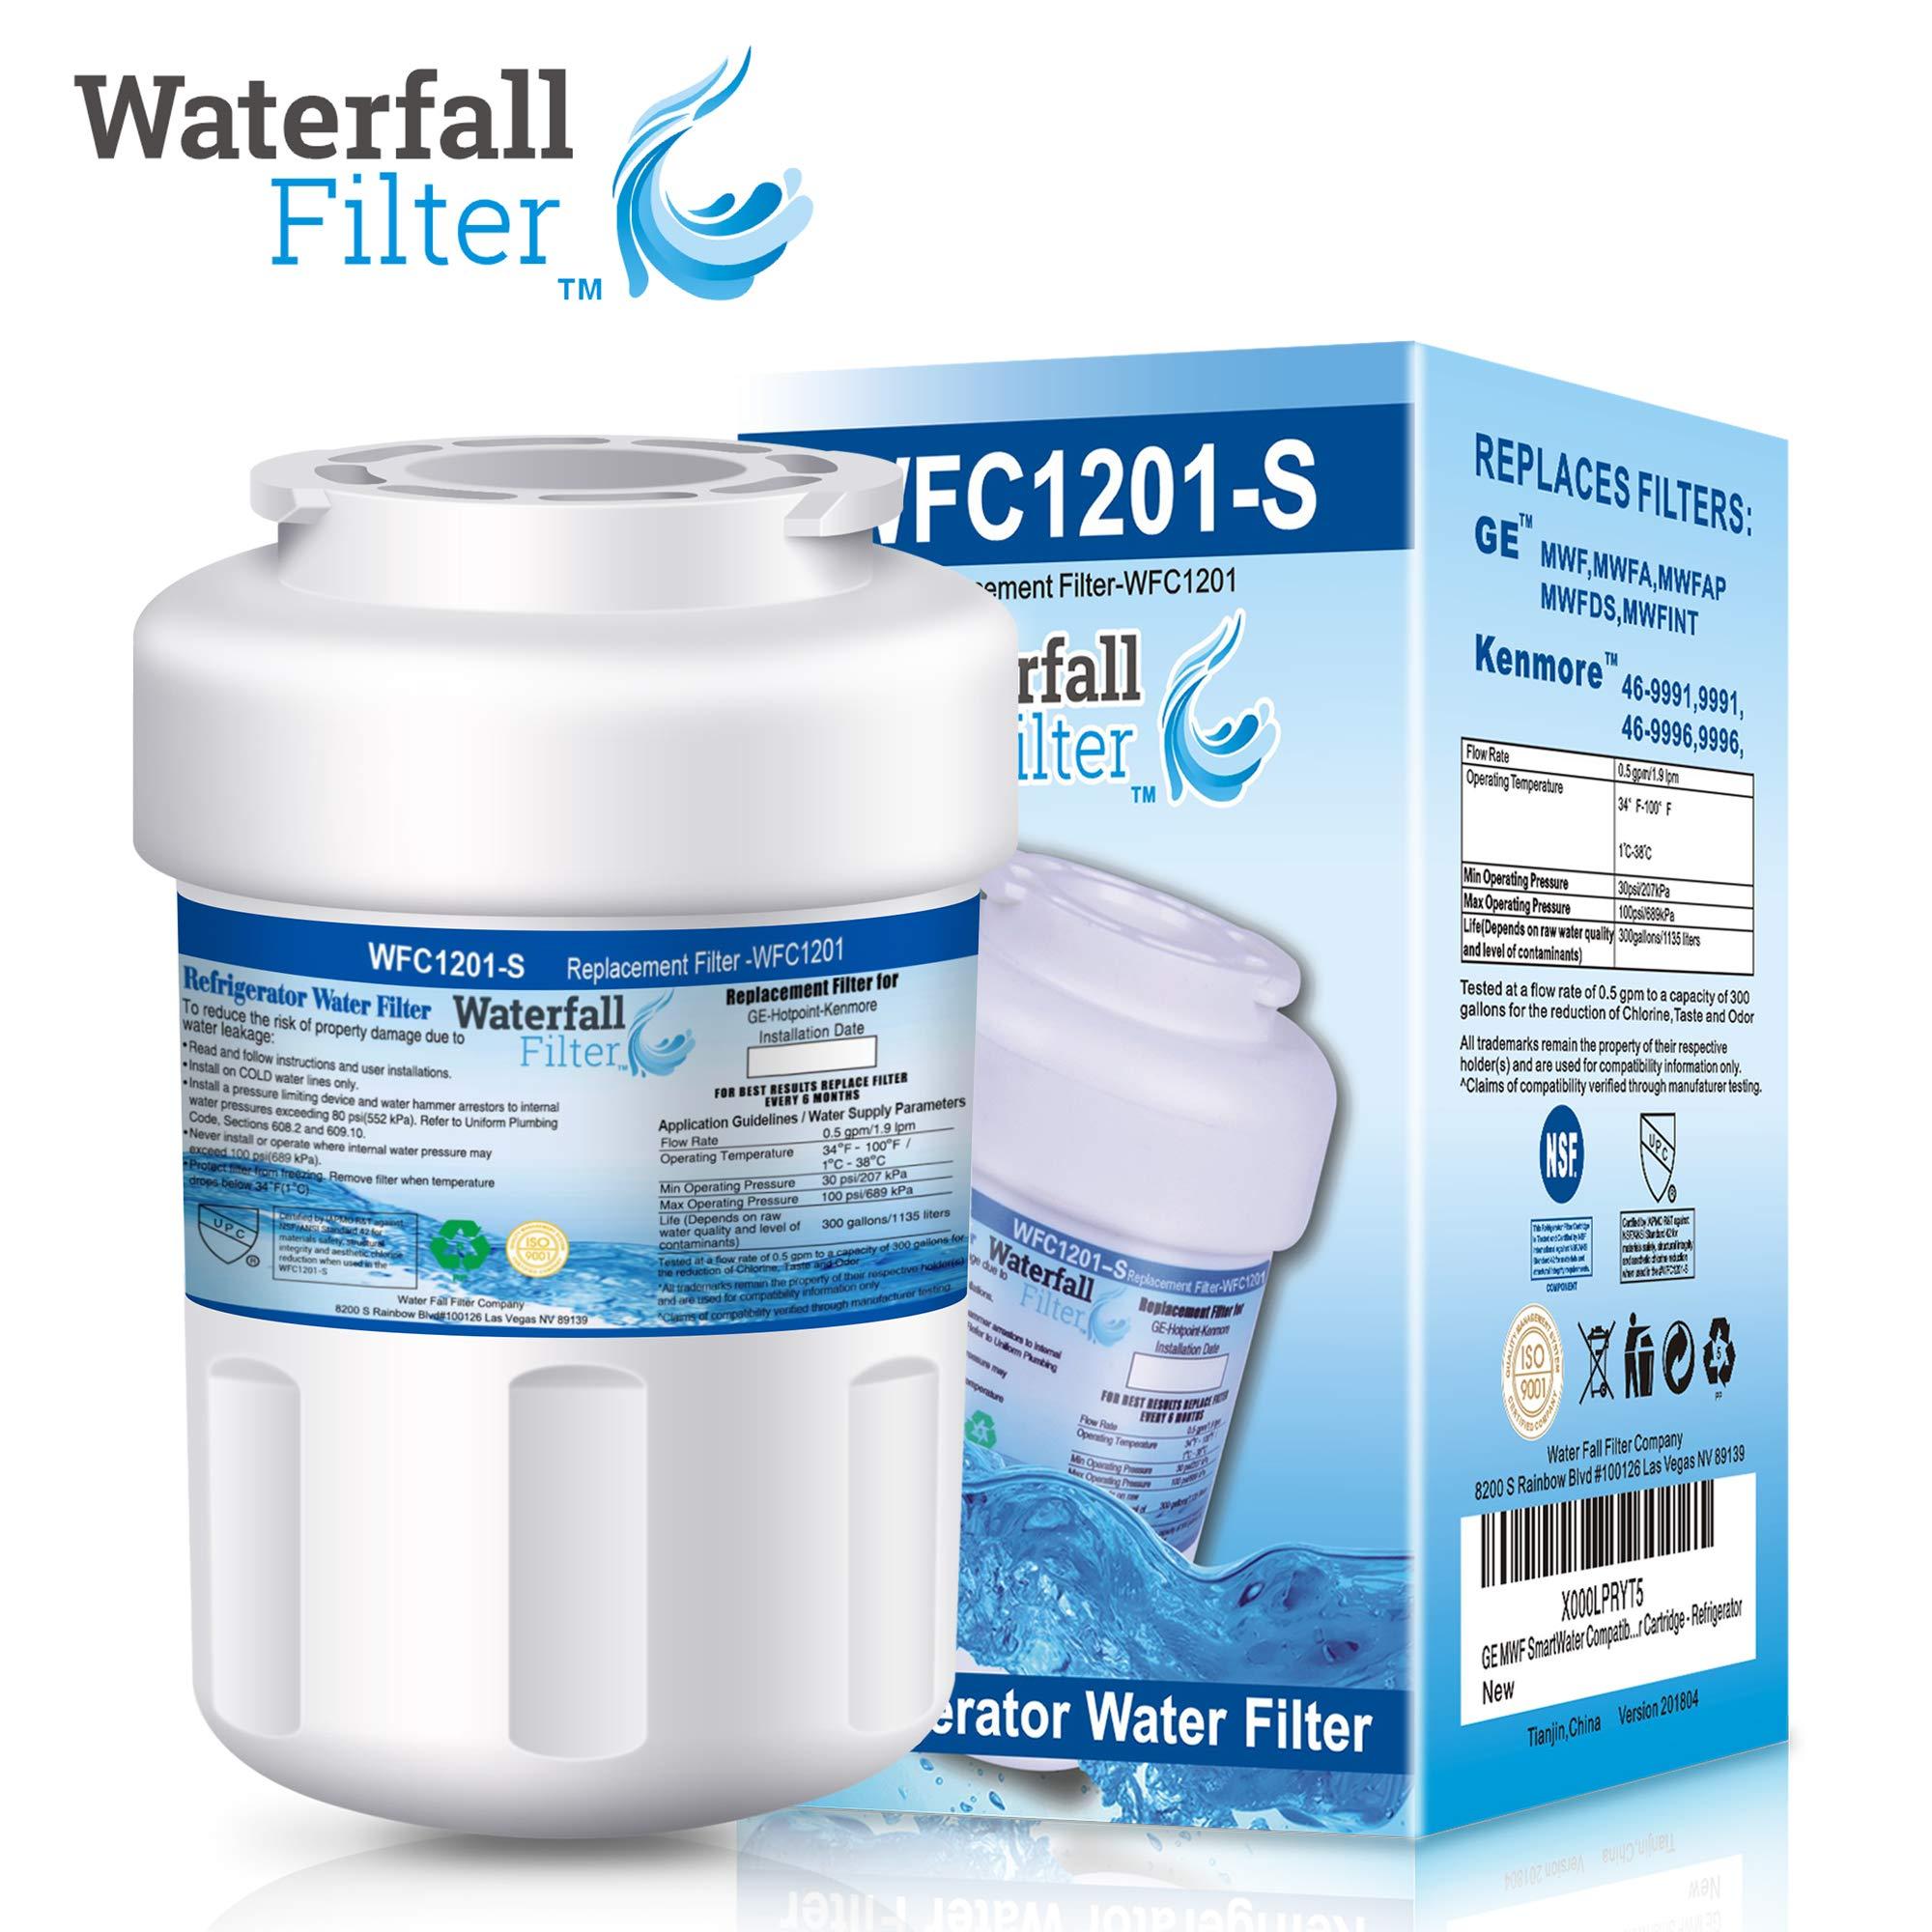 GE MWF GWFA GWF06 Refrigerator Water Filter Cartridges Smartwater New